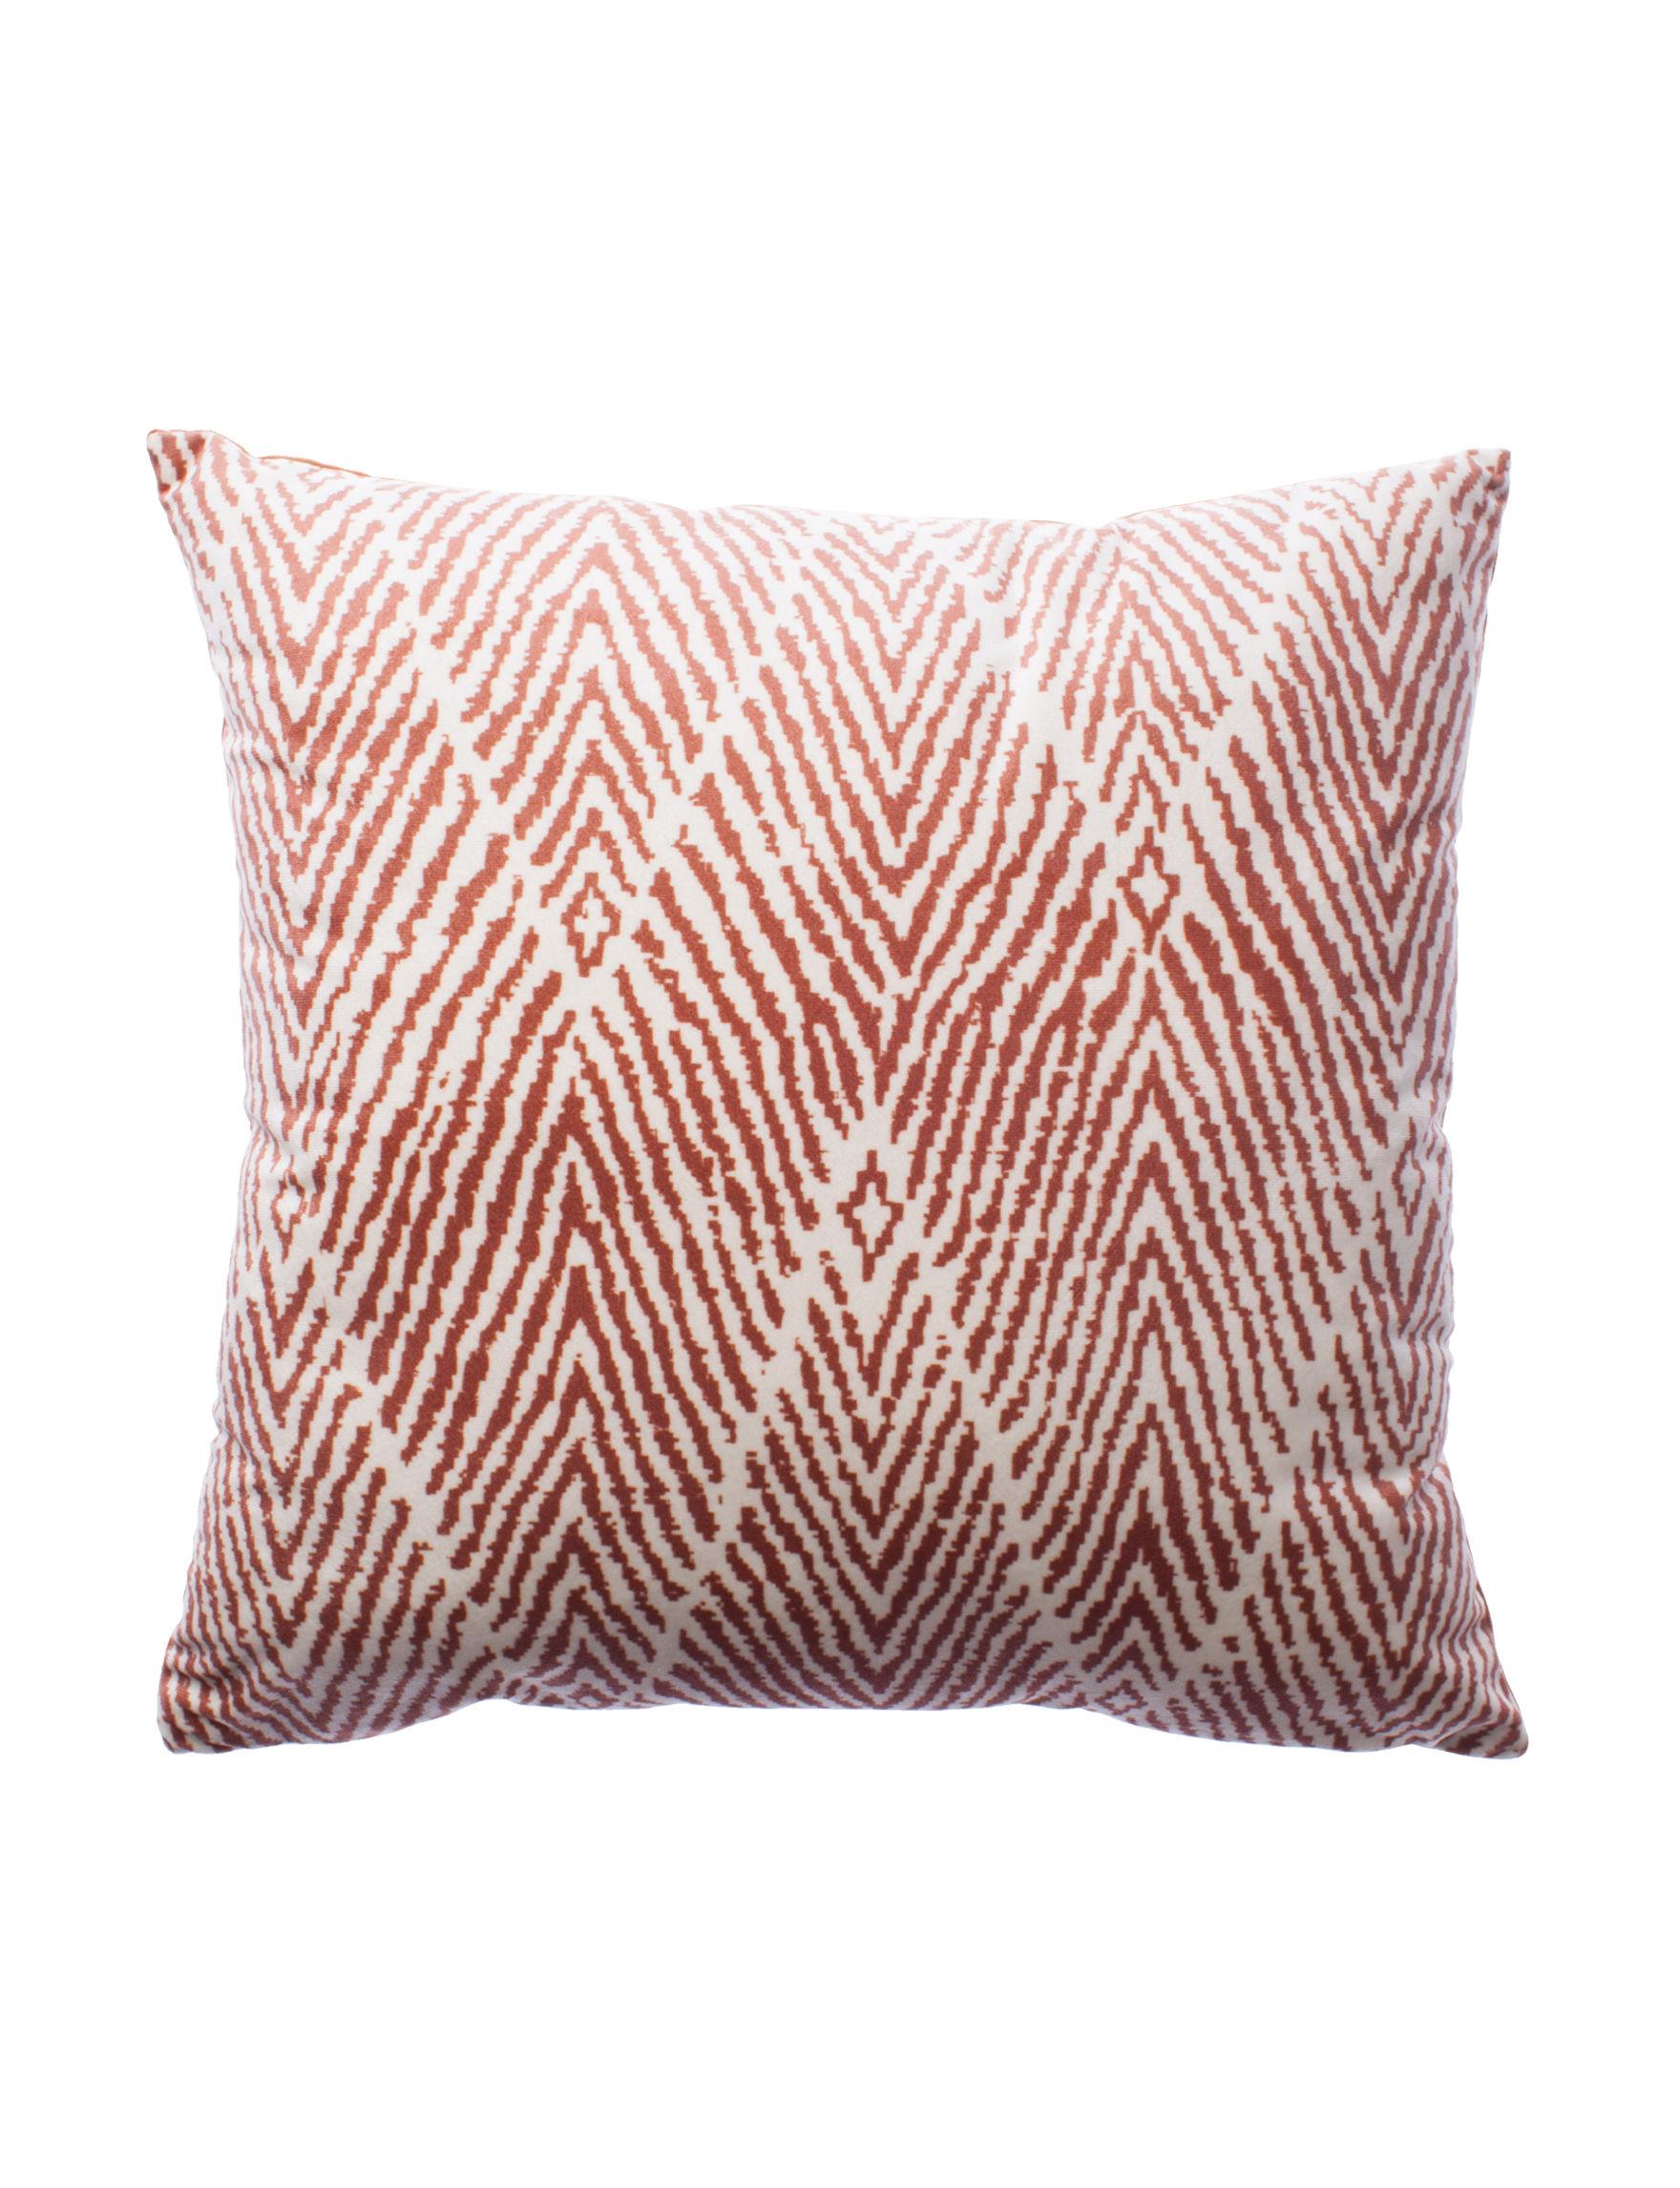 Deco Brown Decorative Pillows